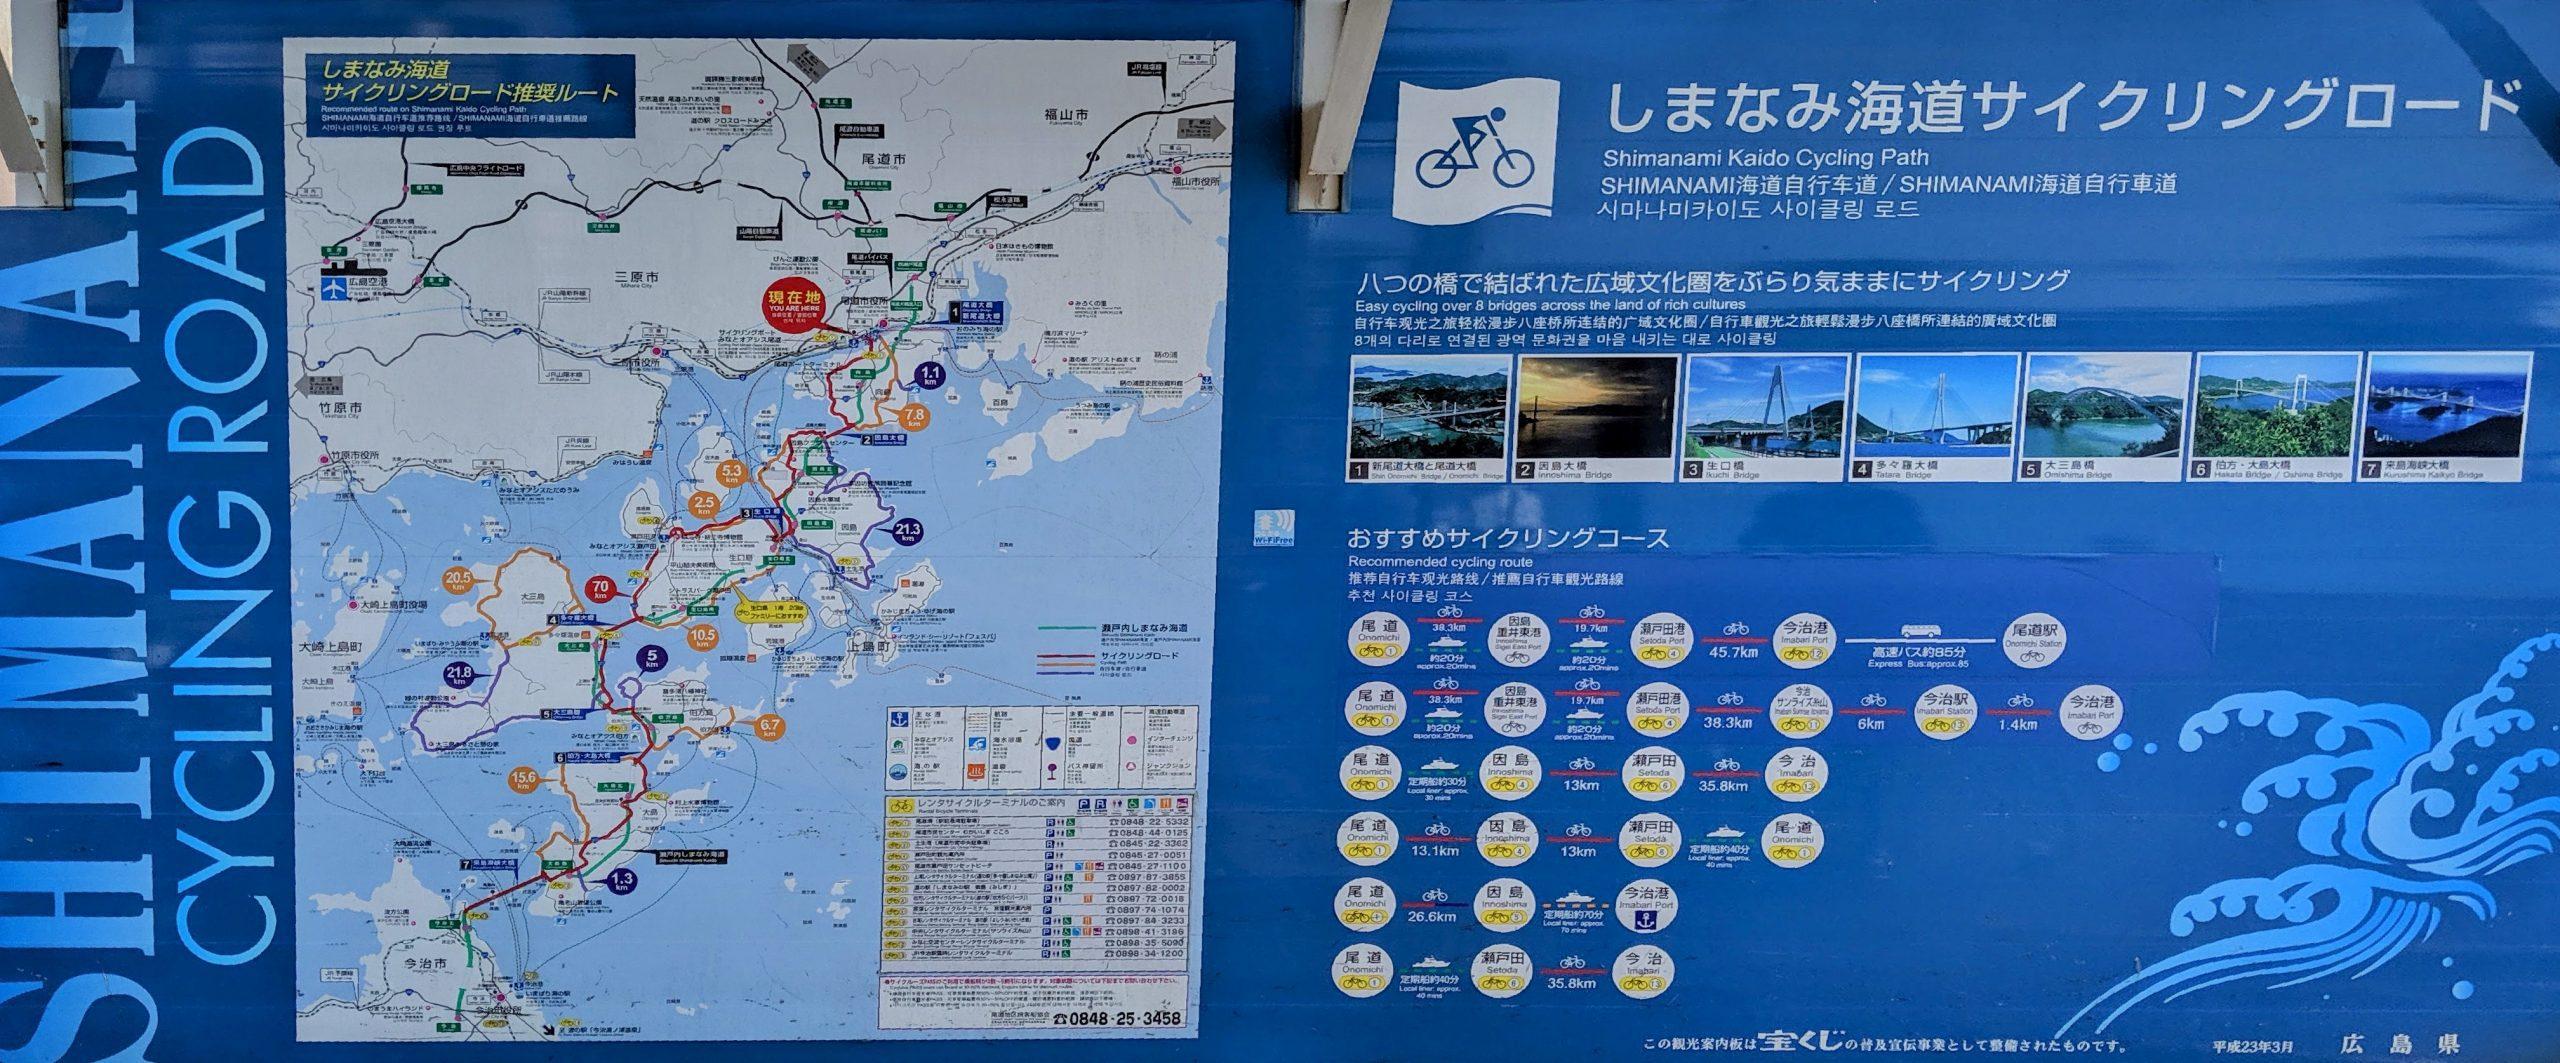 Full Shimanami Kaido Cycling Route Map